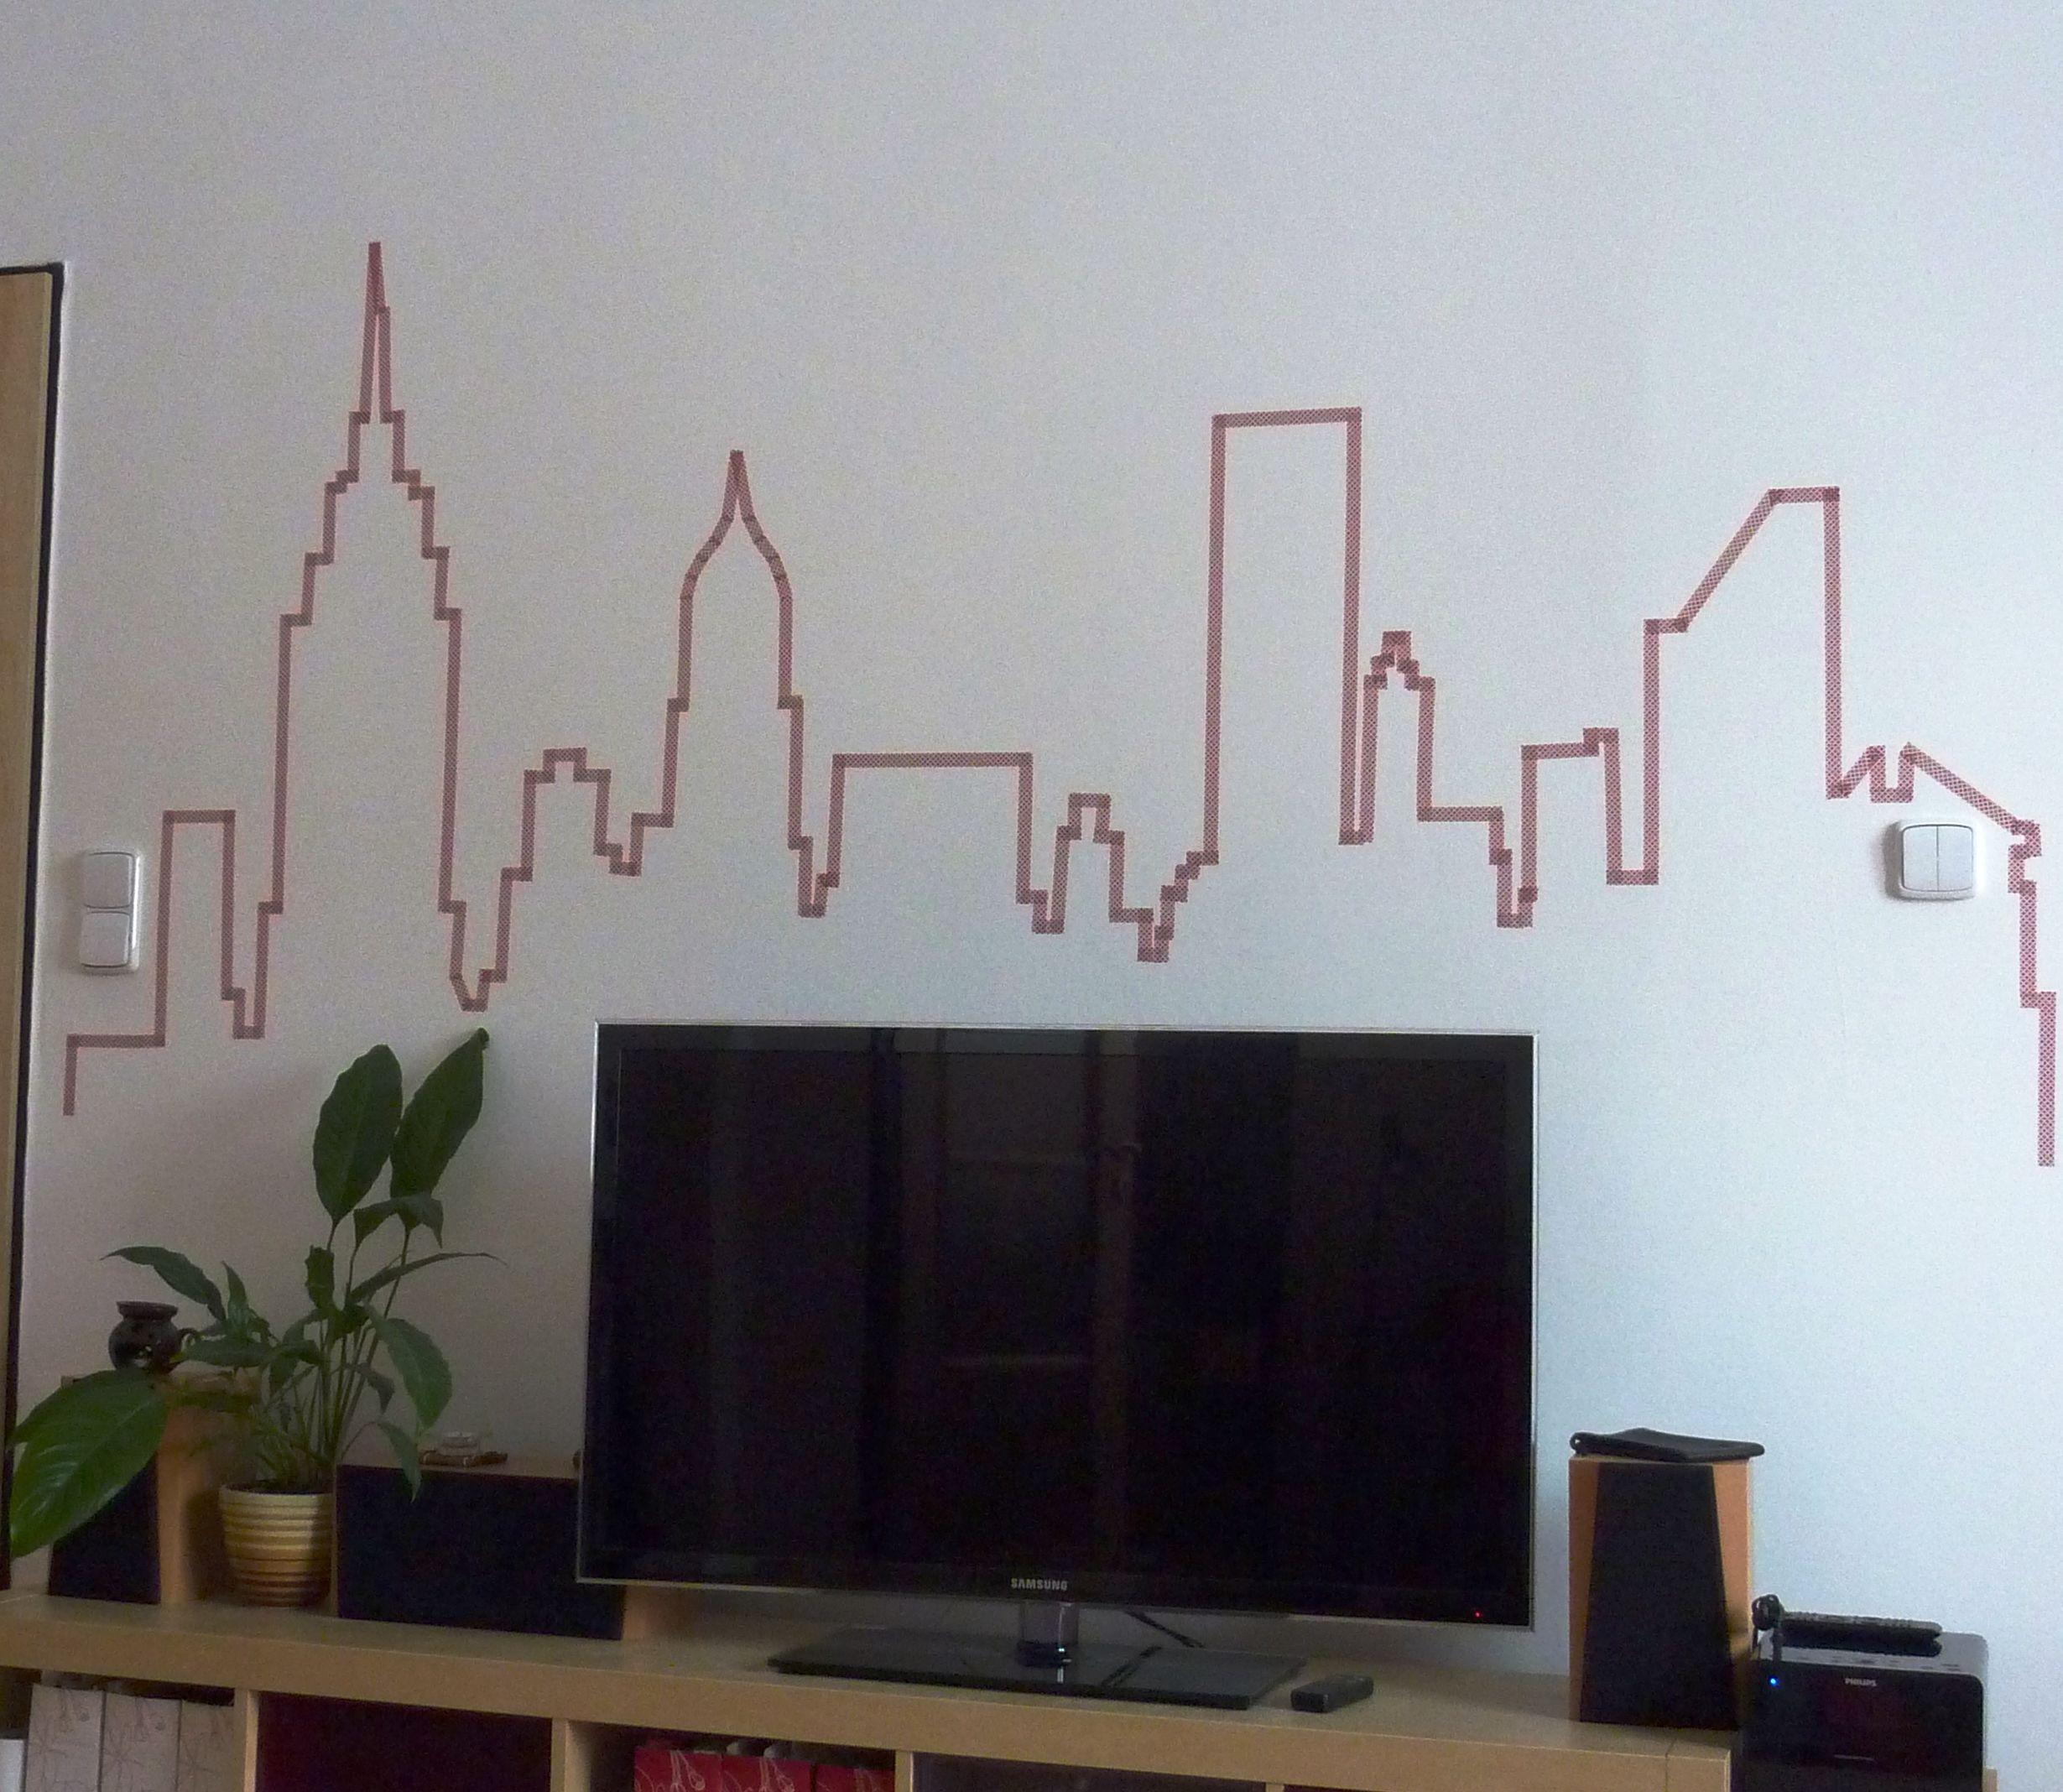 NYC skyline | Habitación tumblr | Pinterest | Pinturas en paredes ...